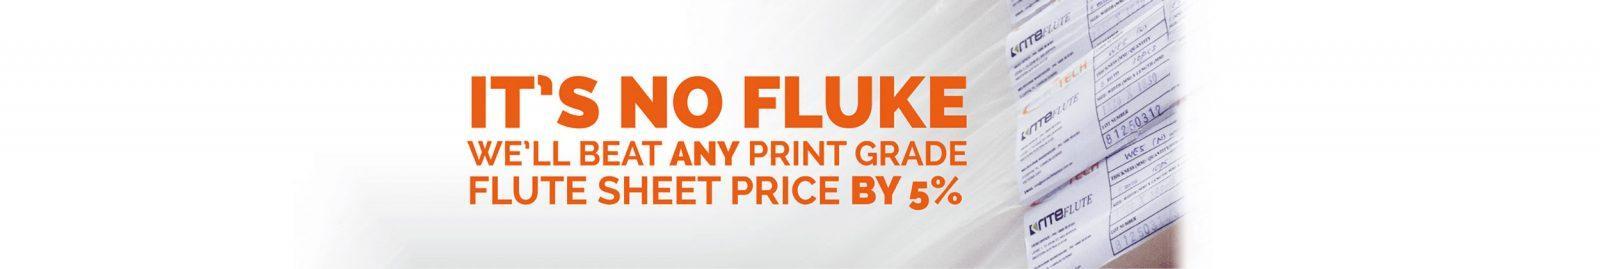 Flute Sheet Price